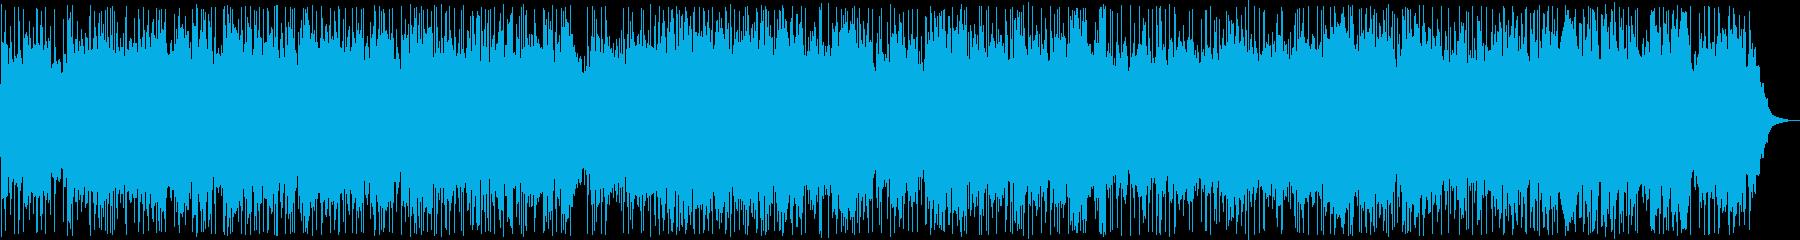 Nineteen spring / Okinawan folk song's reproduced waveform